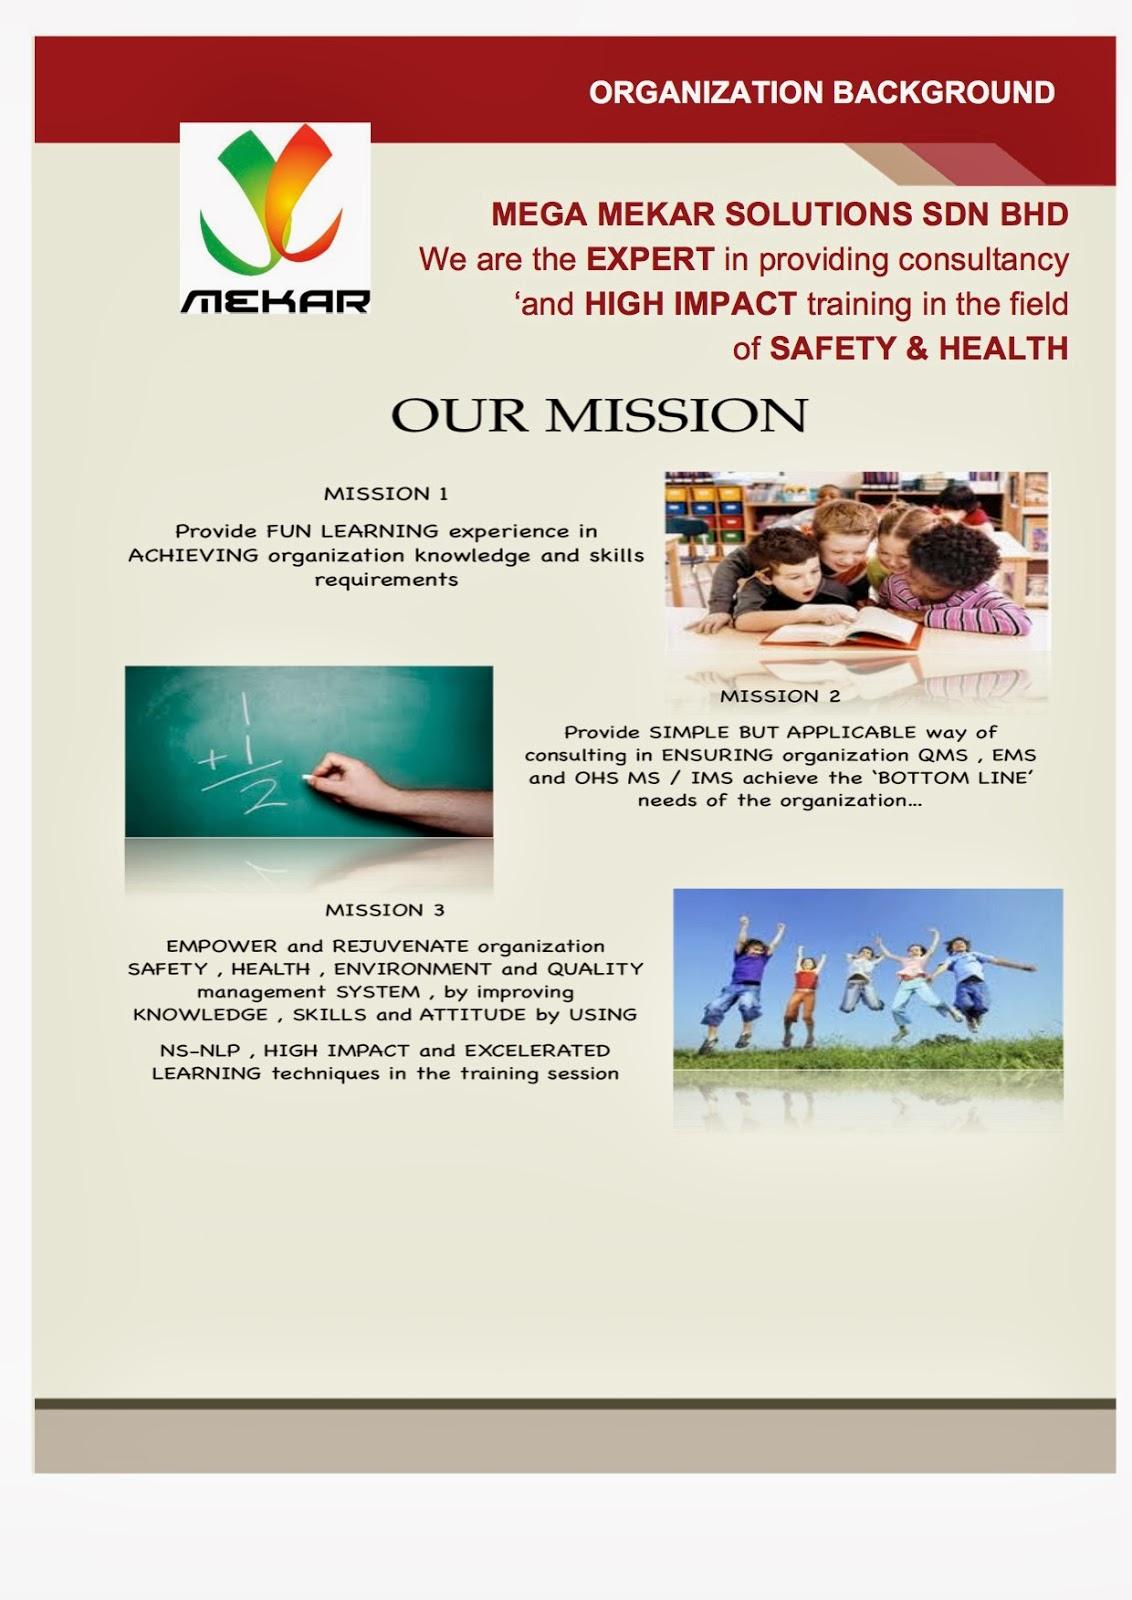 Osh e q guru mega mekar solutions sdn bhd our mission for E bathroom solution sdn bhd